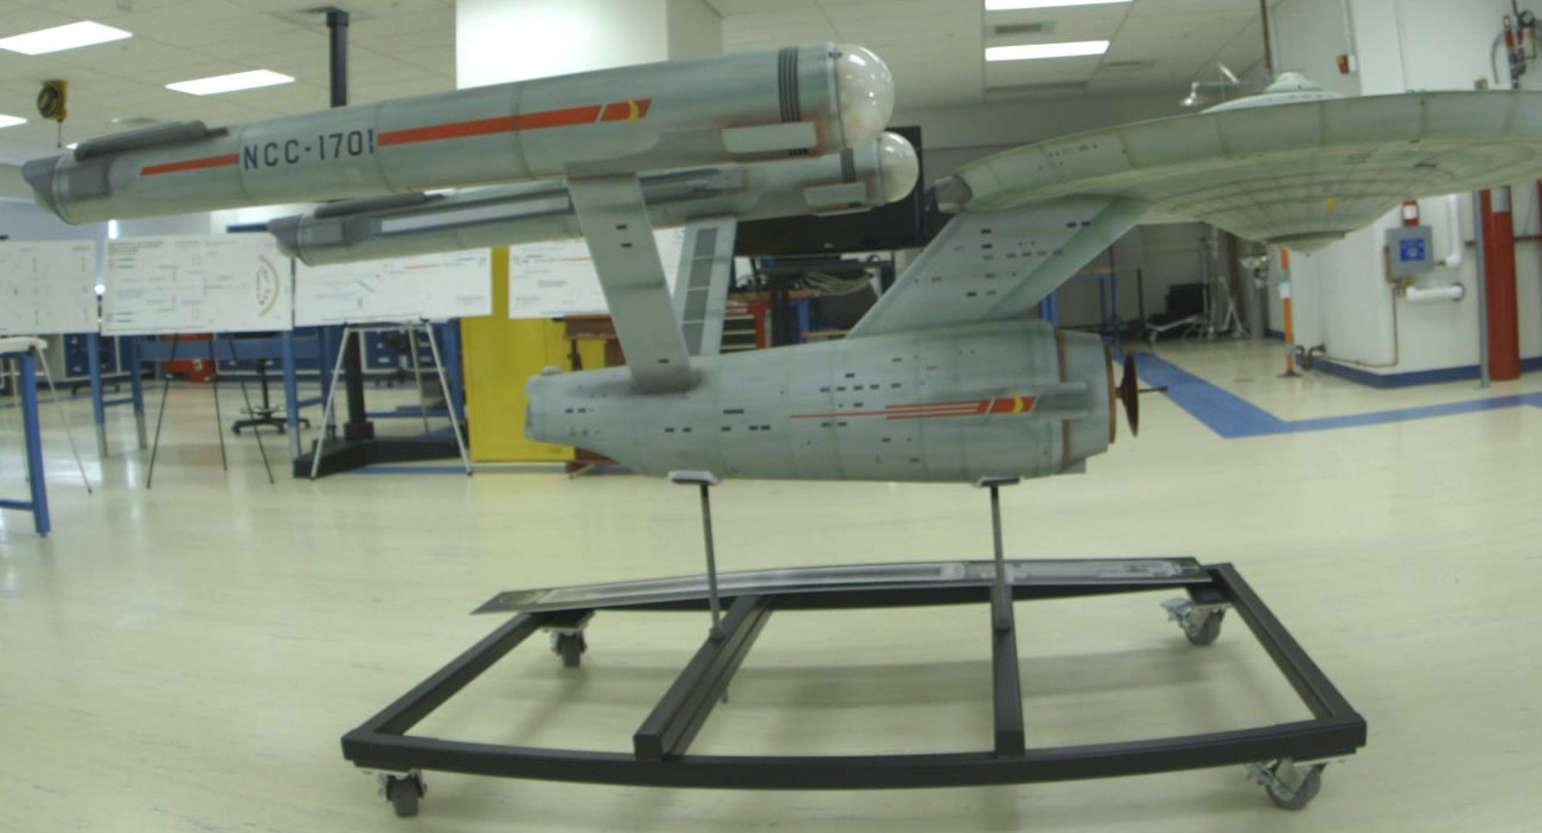 'Building Star Trek' Documentary Shows Efforts to Save Original Enterprise Model